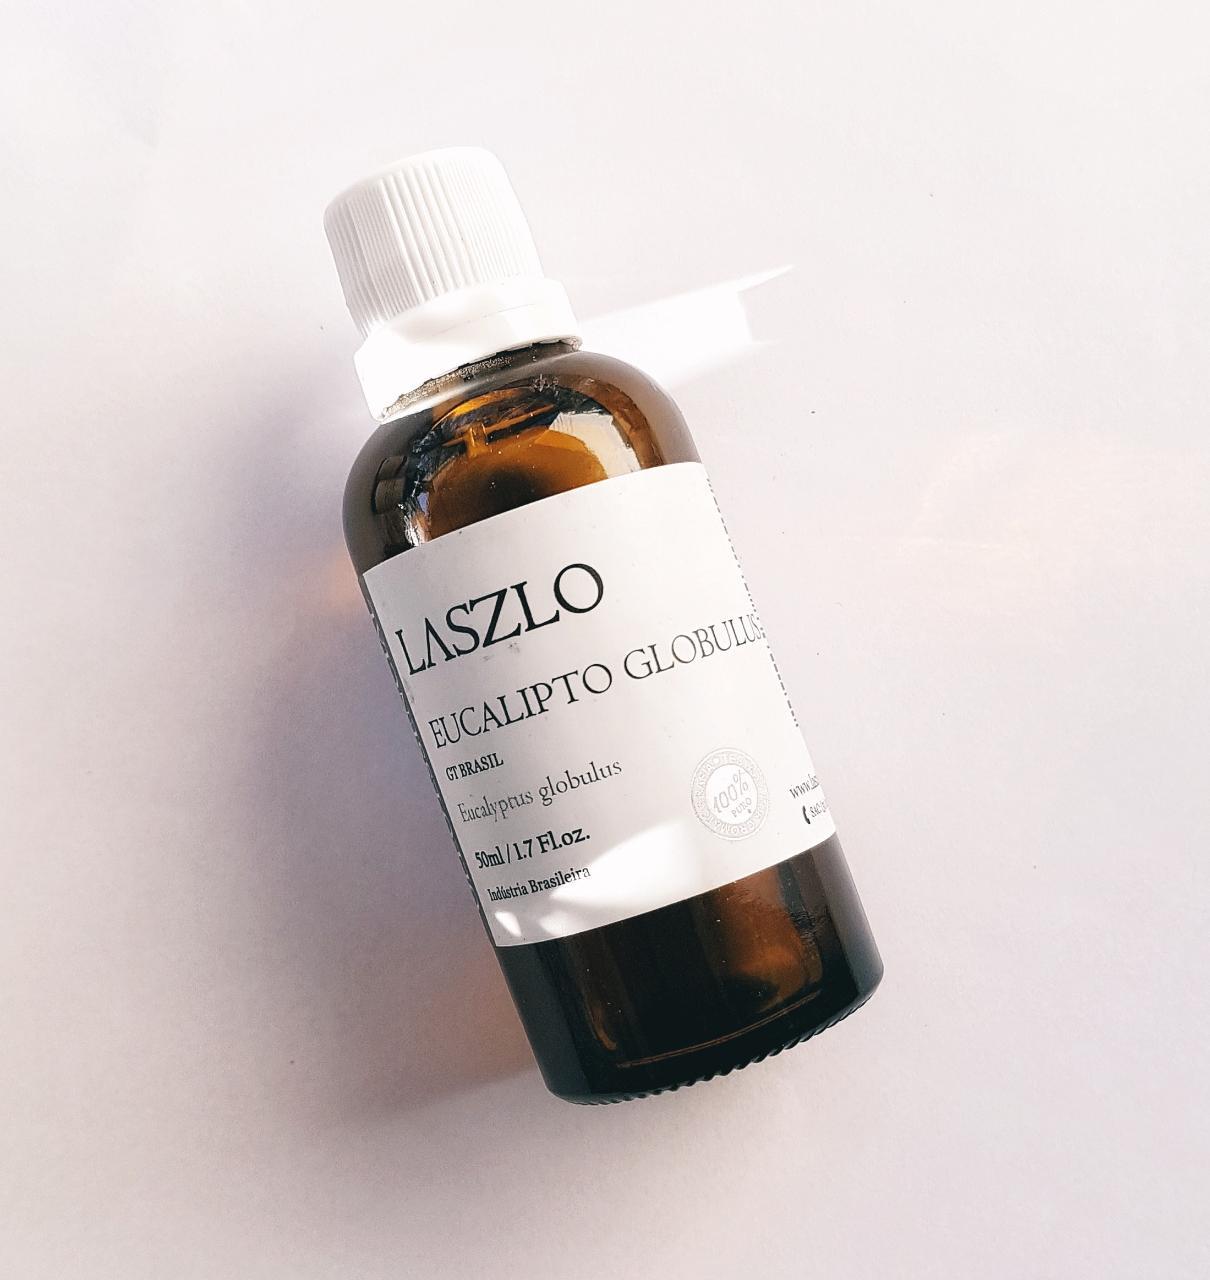 Óleo Essencial - Eucalipto Globulus - Laszlo  - SALVIA